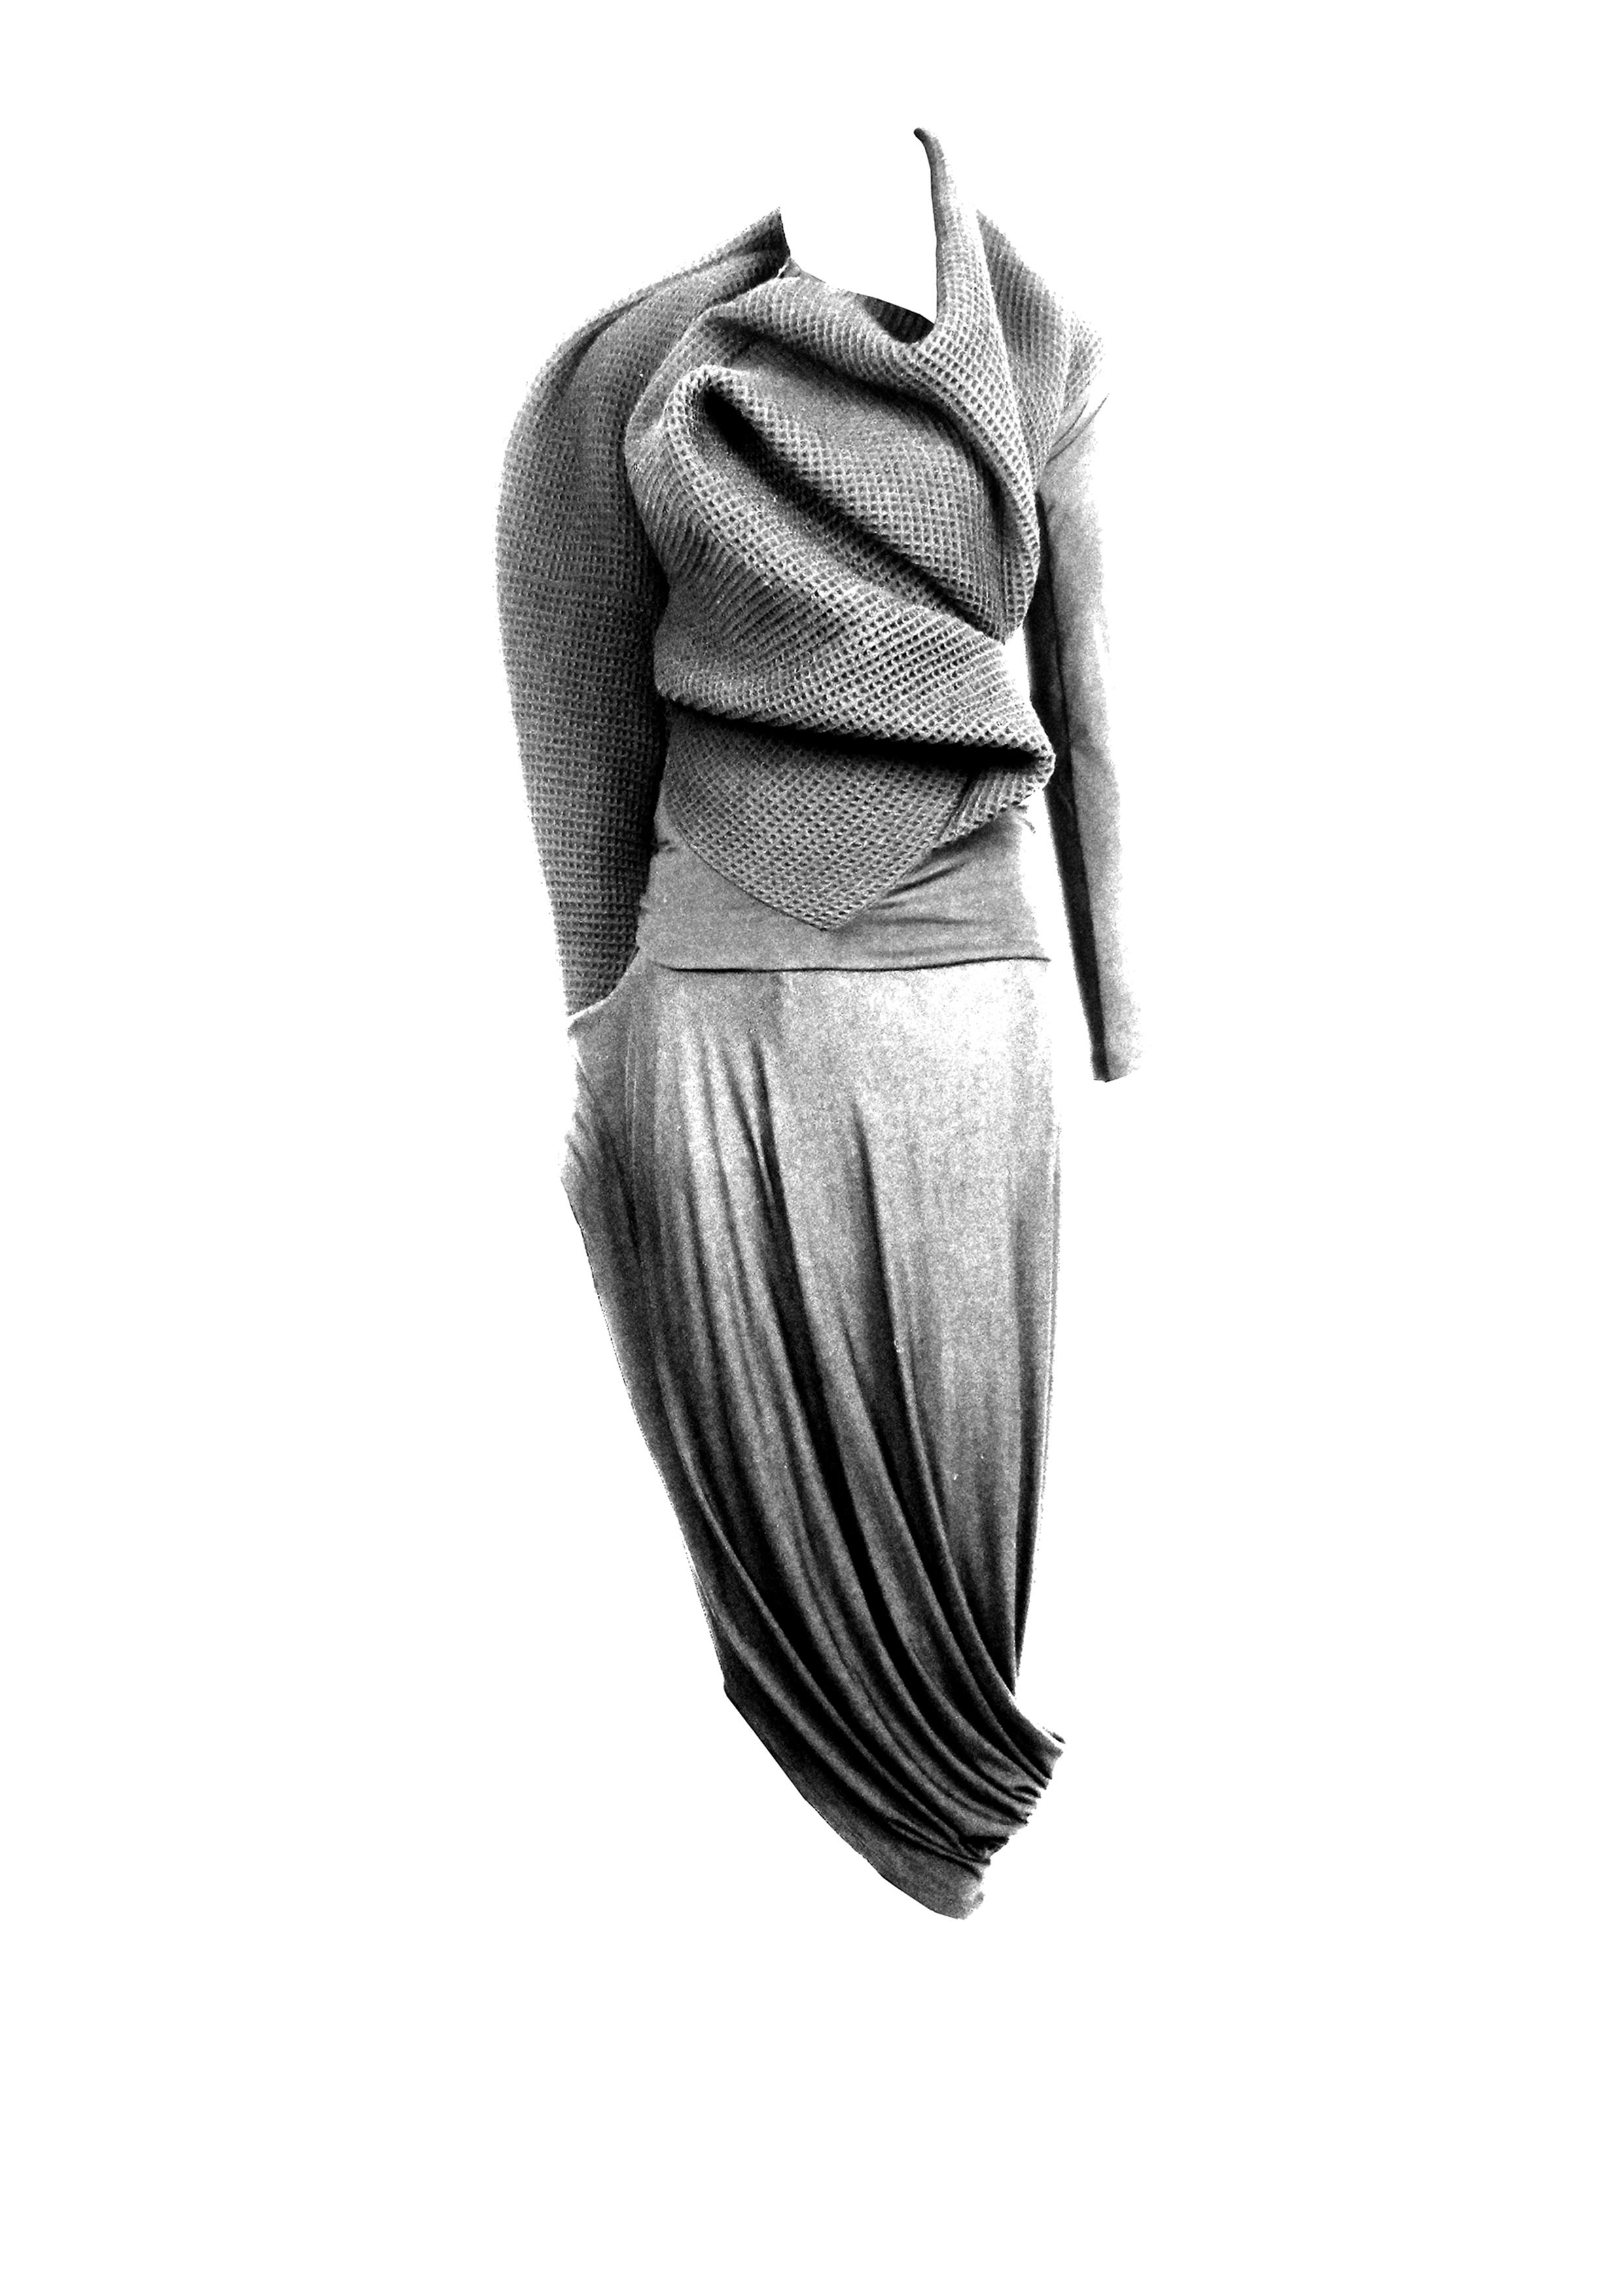 Spiral Top & Swoop Skirt